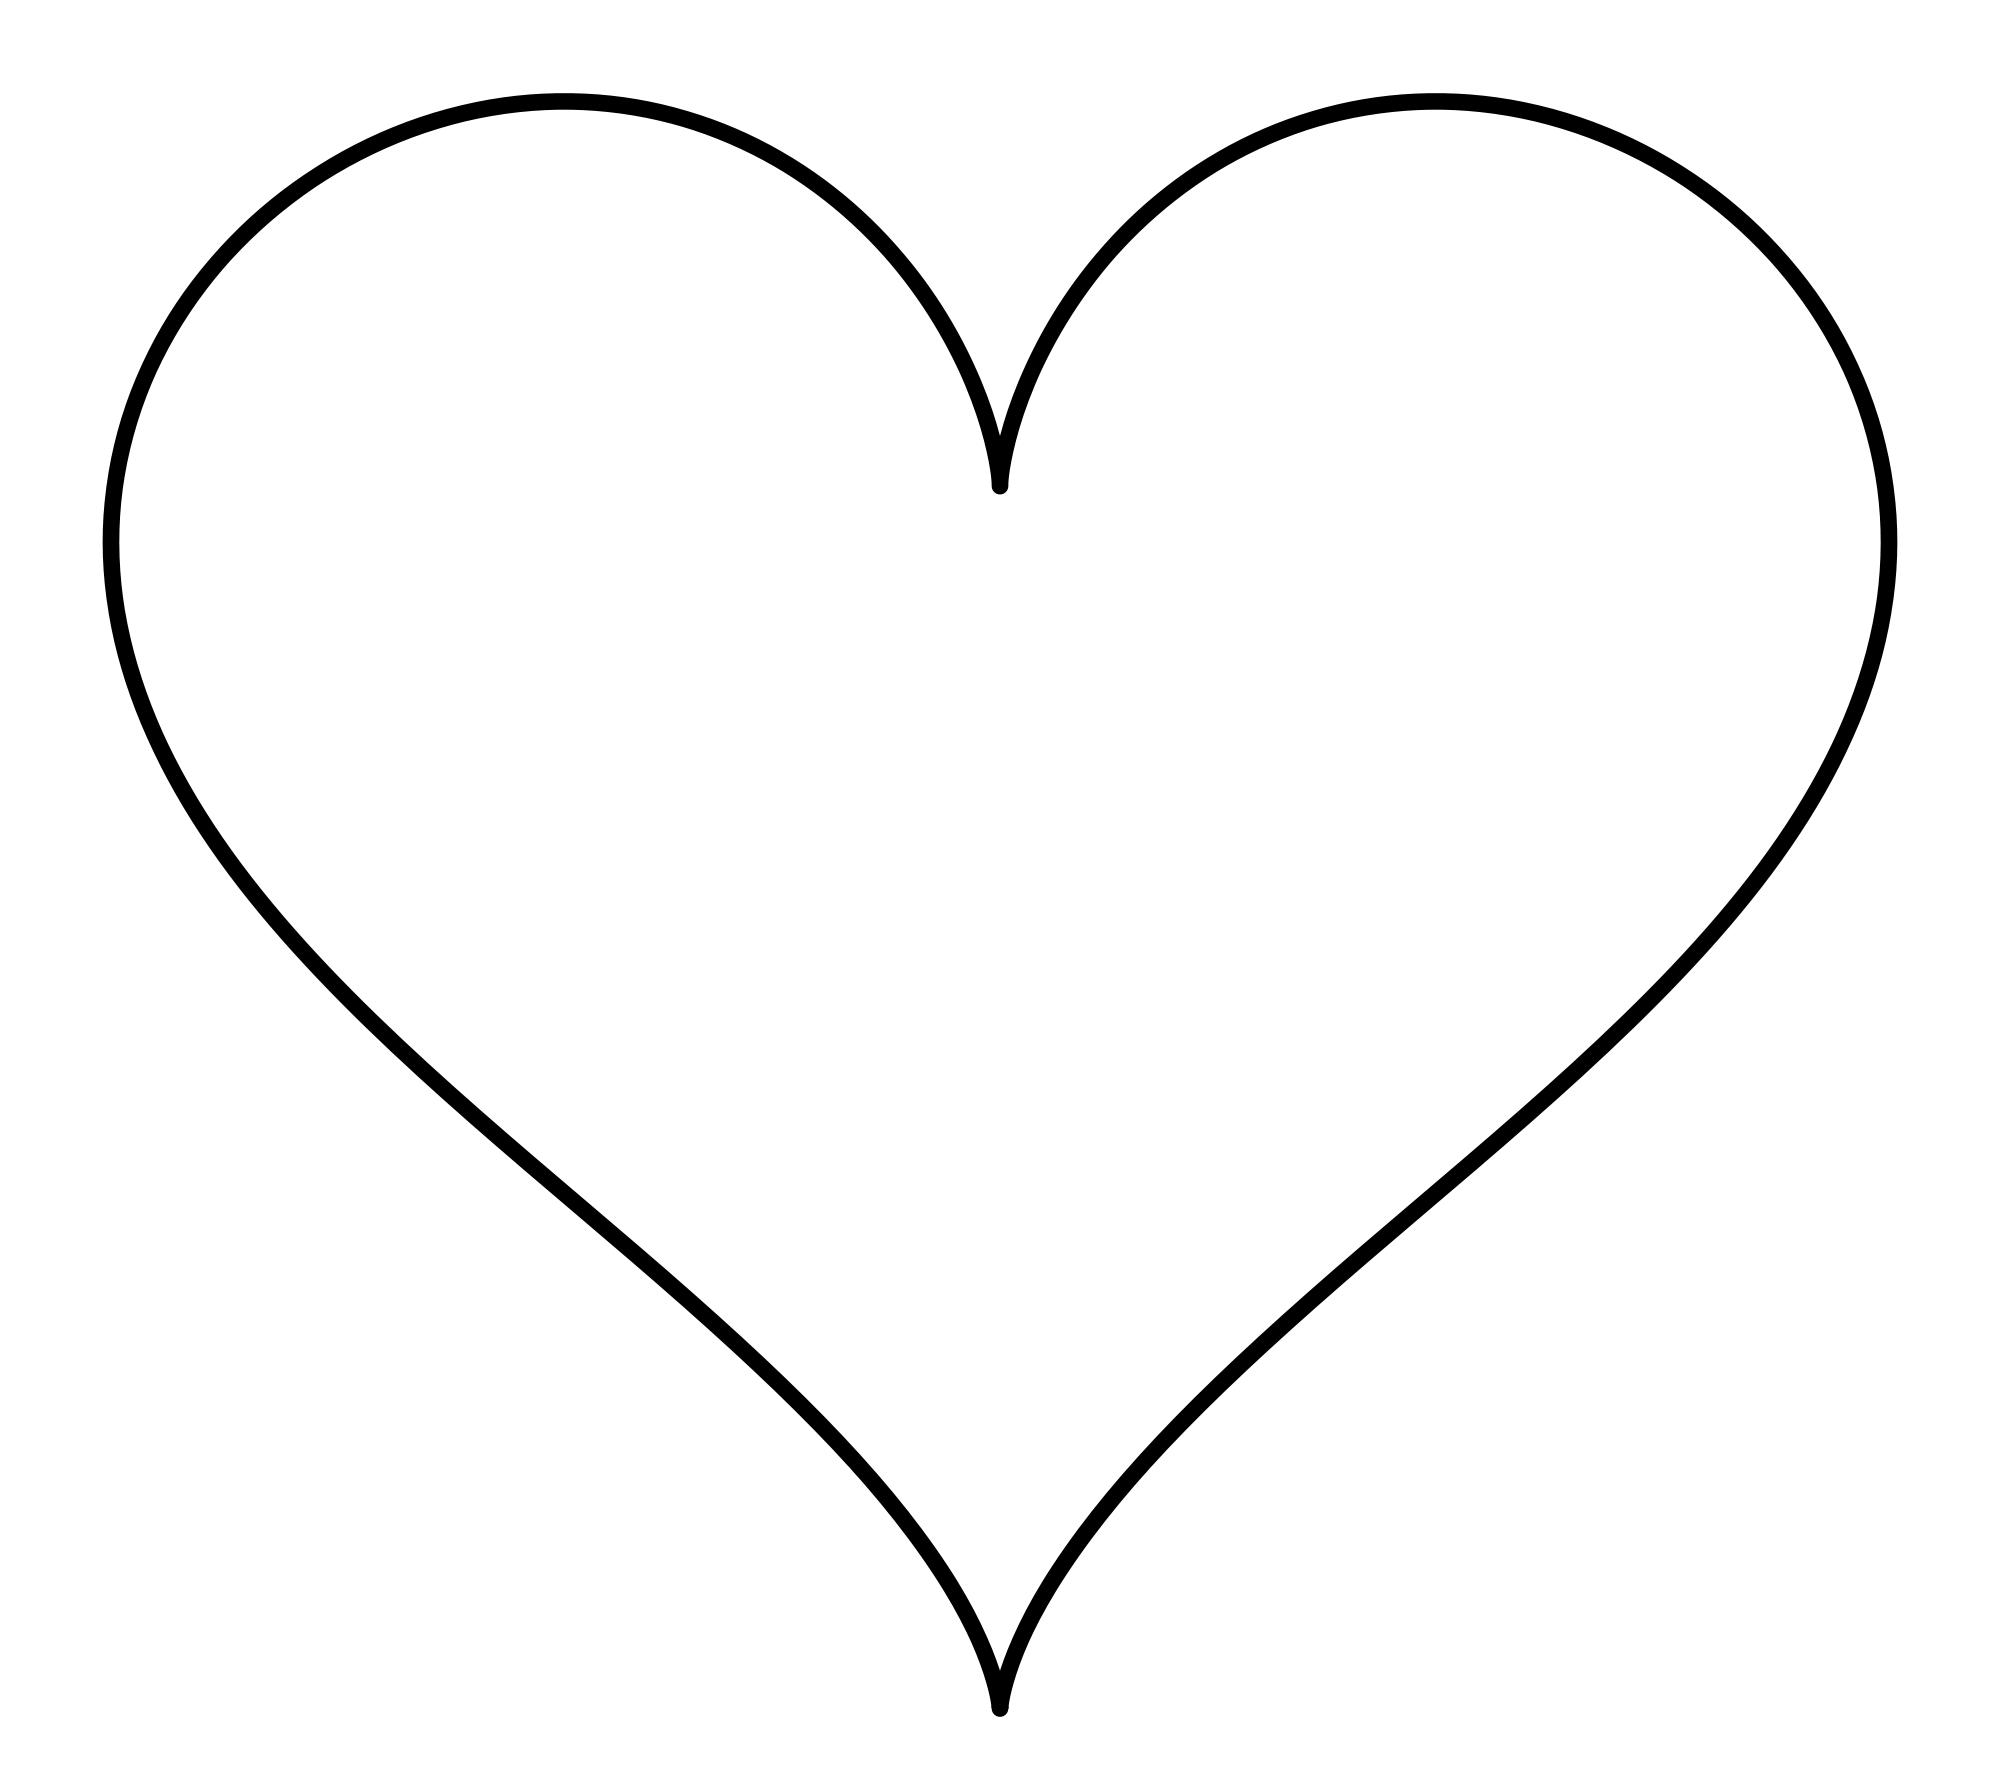 Heart-shaped clipart diamond shape Heart Free encyclopedia Shape Shape